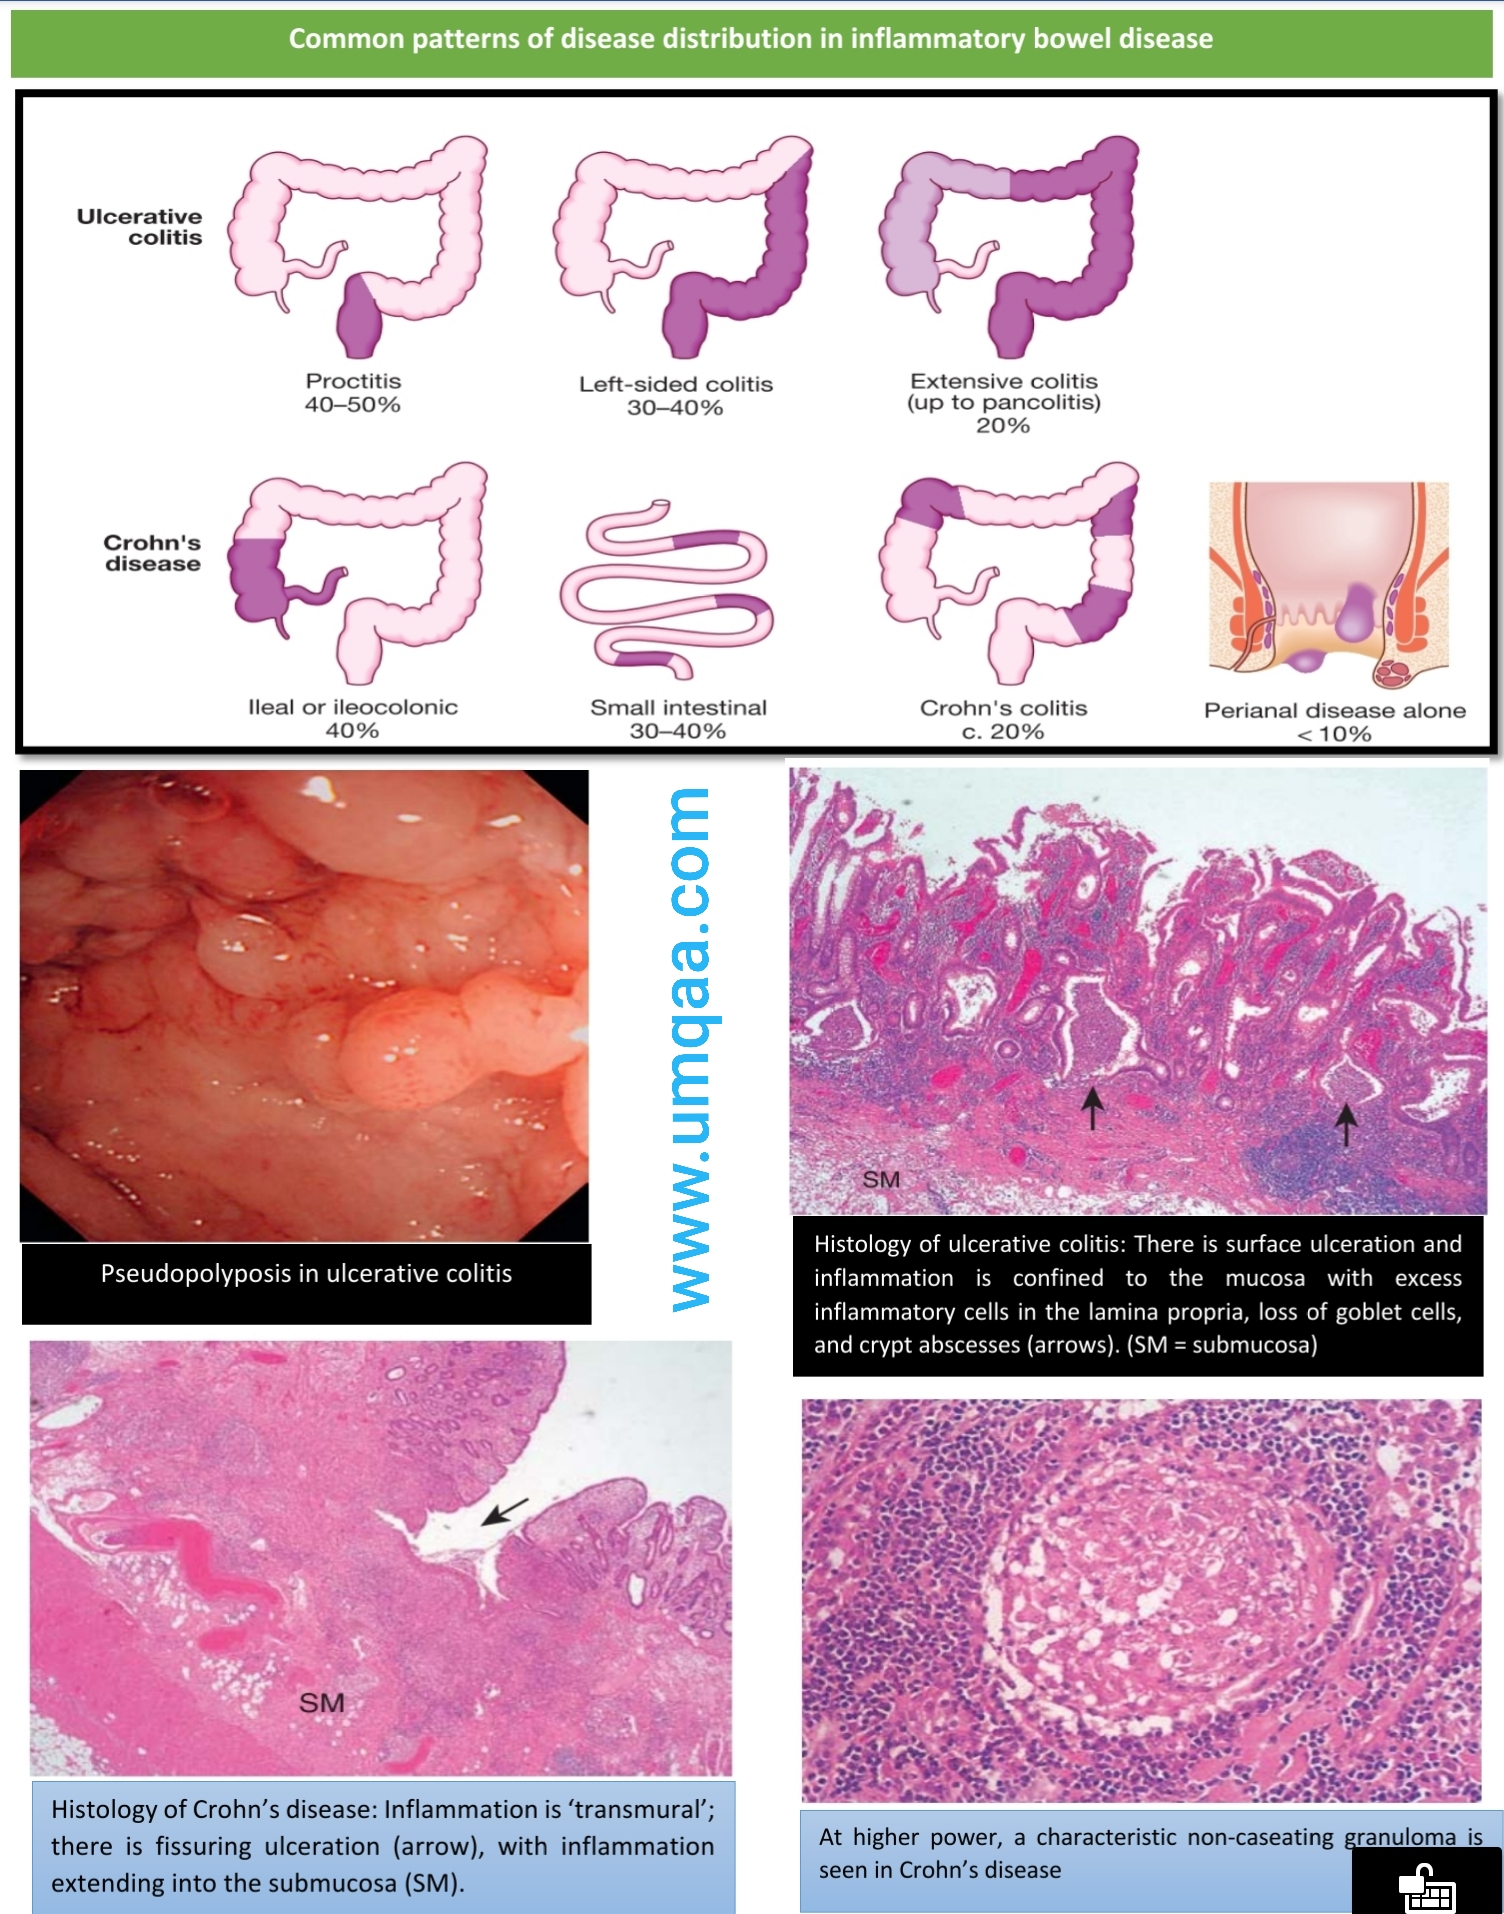 Crohn's disease (CD) and Ulcerative colitis (UC)